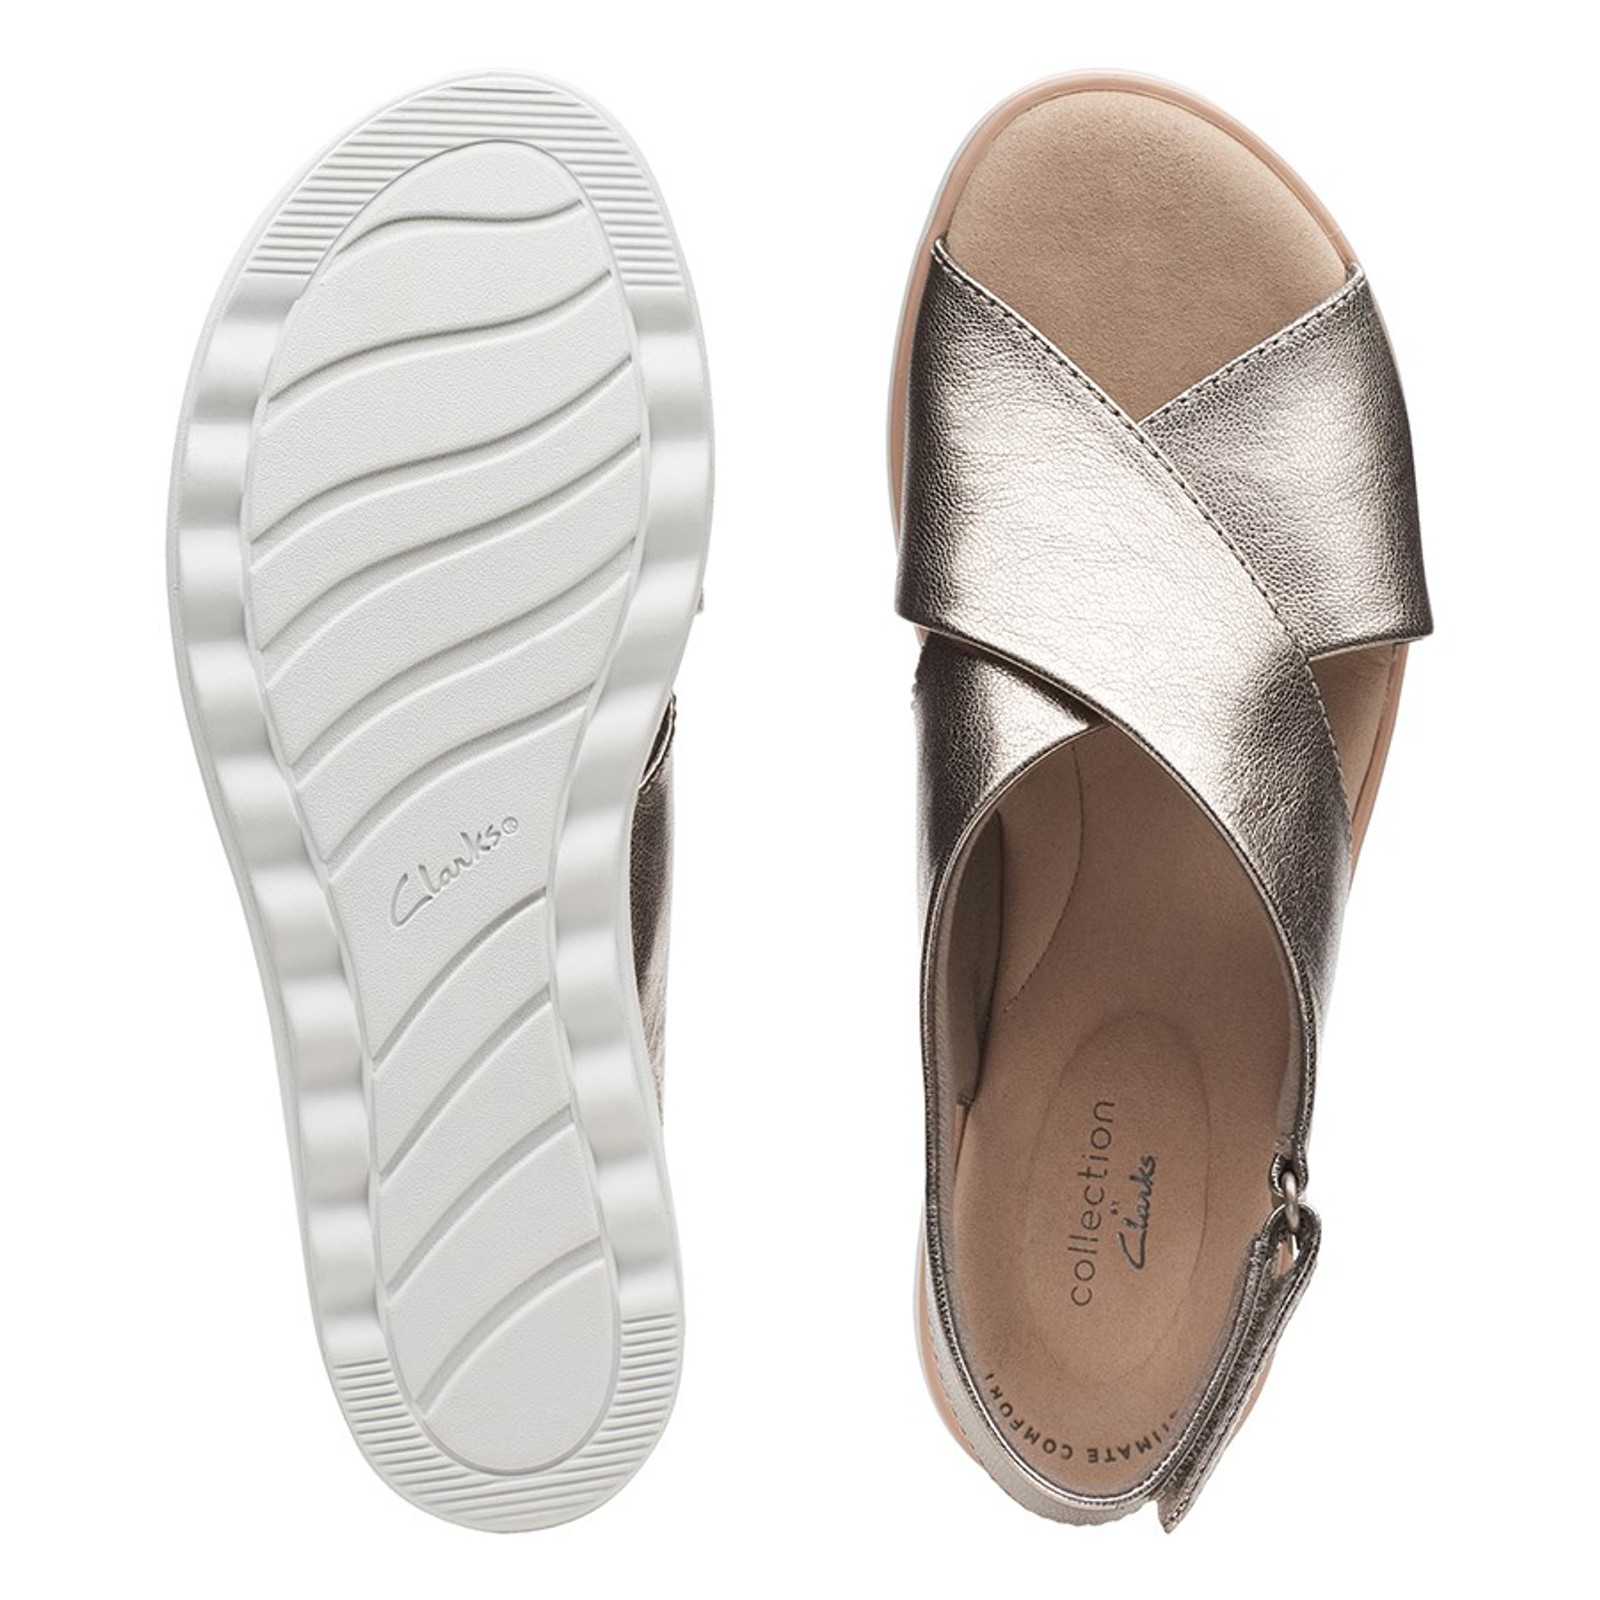 Clarks Womens JILLIAN JEWEL Metallic Leather